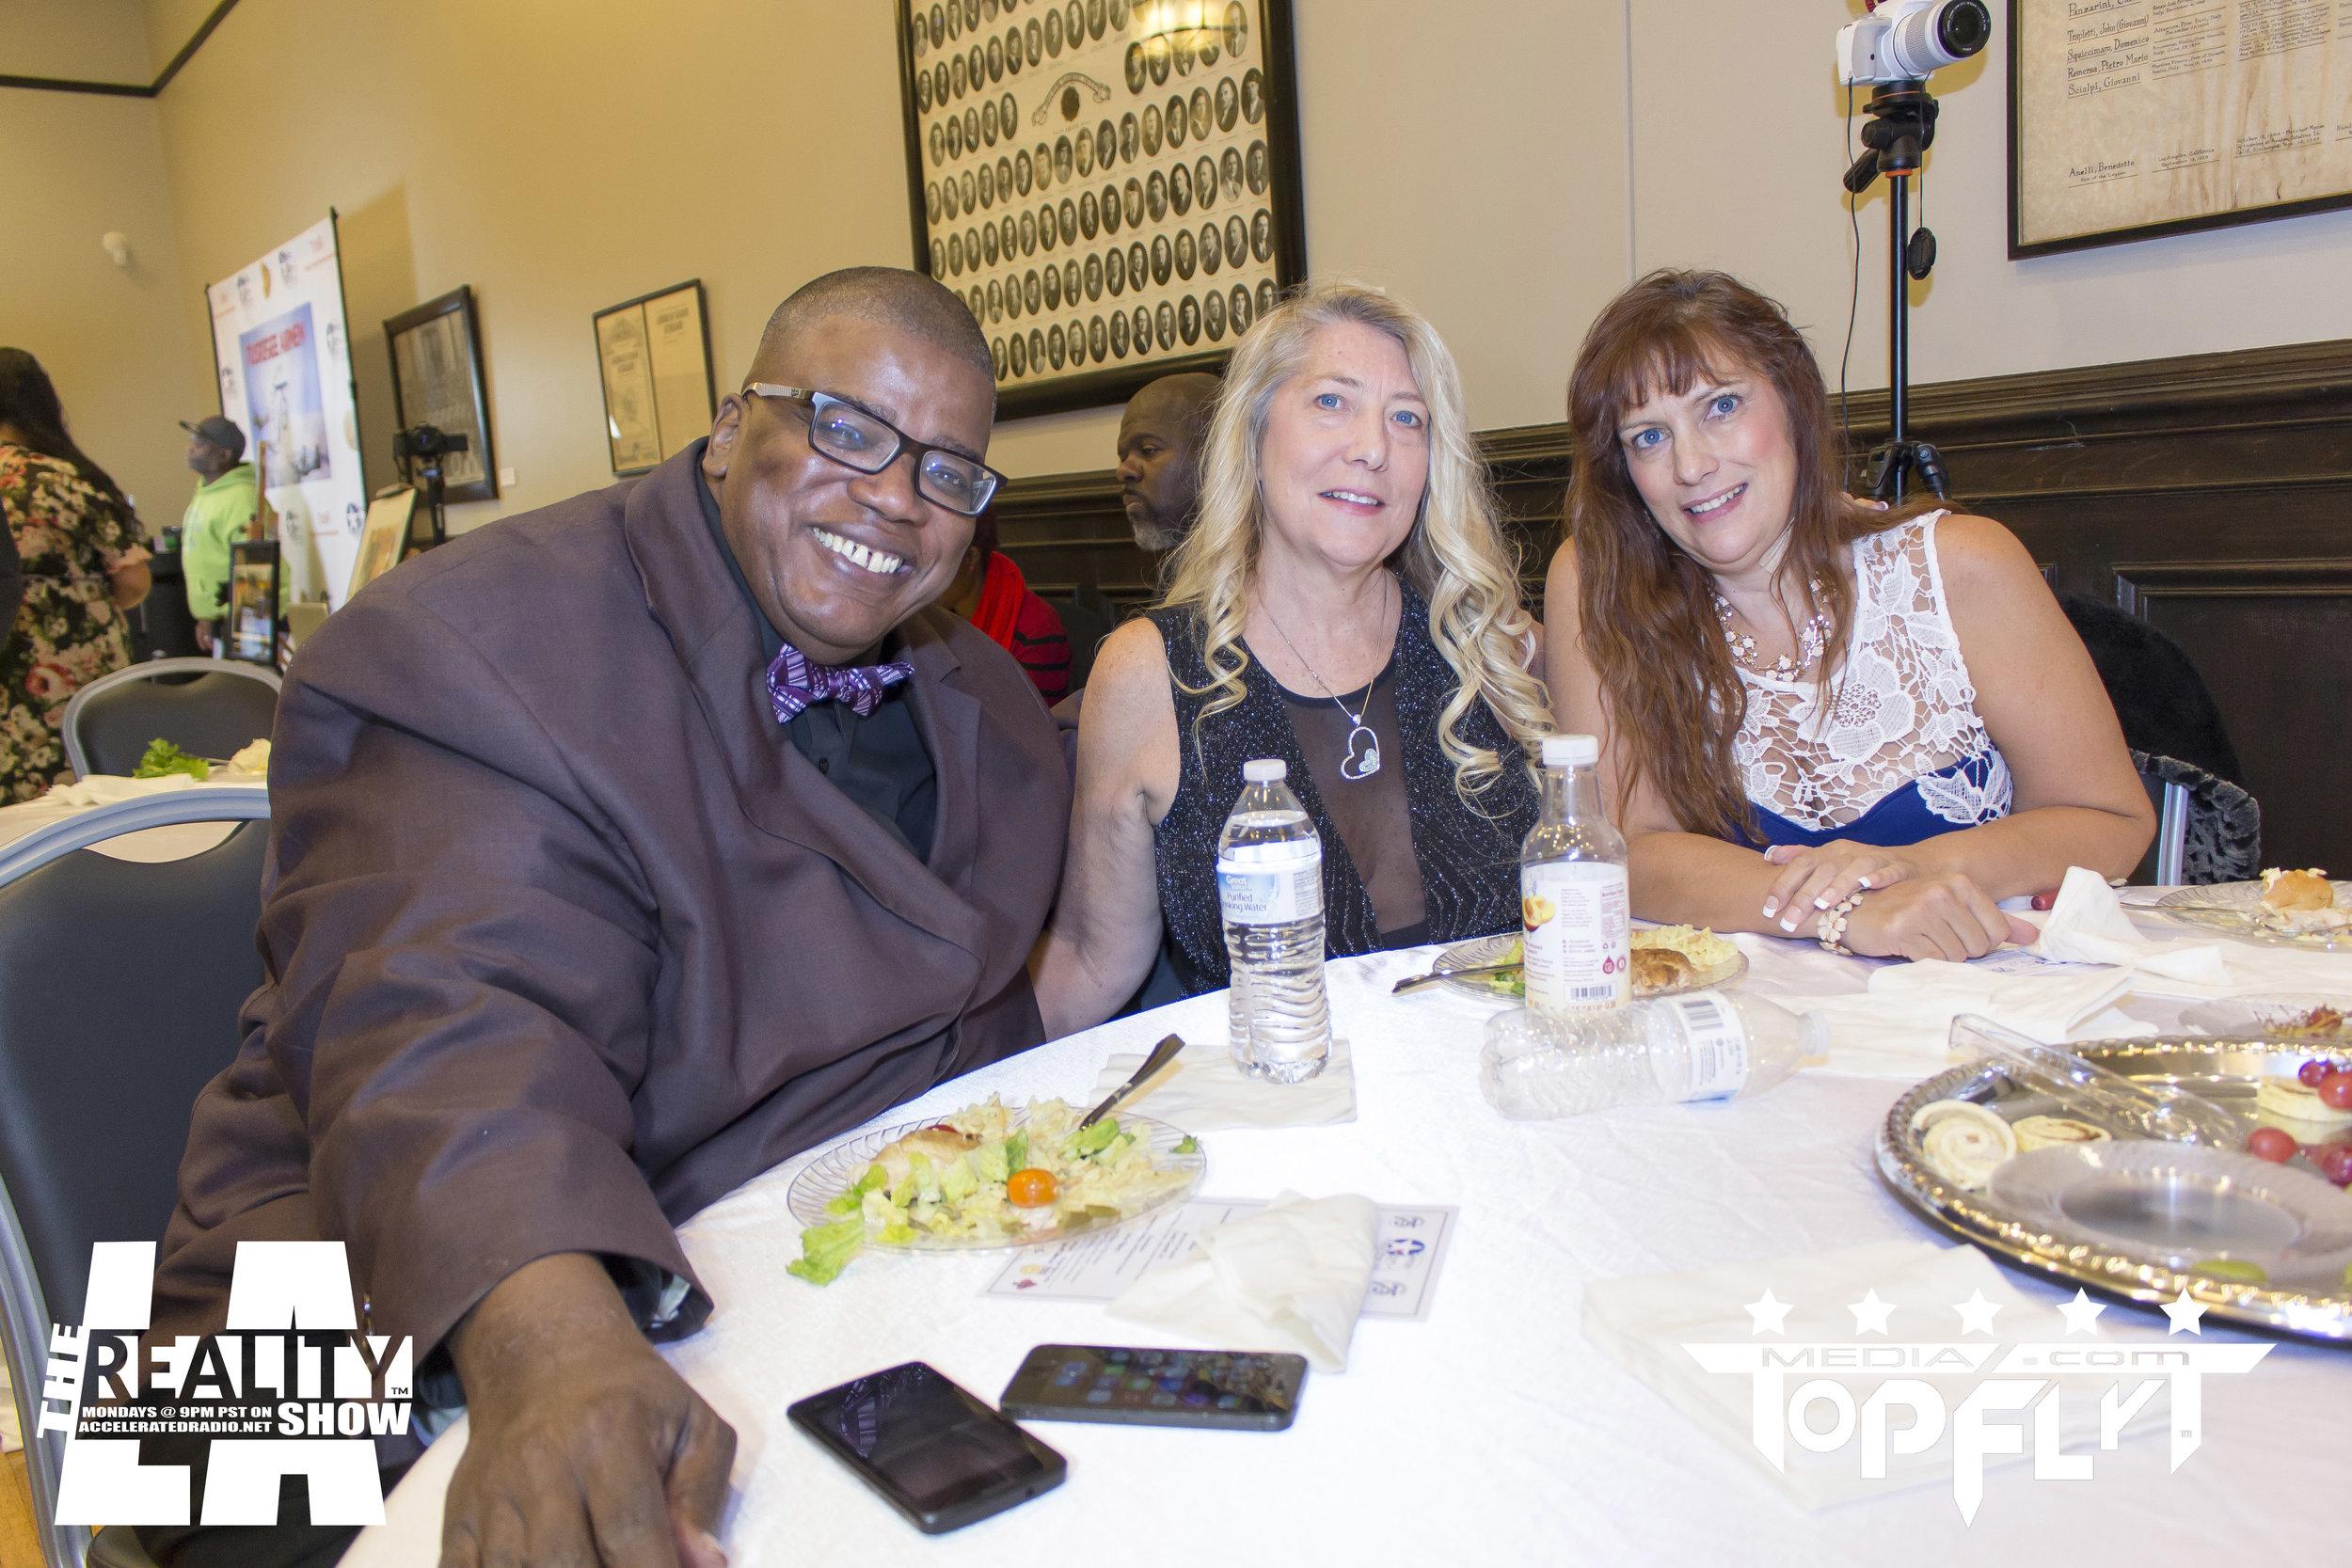 The Reality Show LA - Tuskegee Airmen 75th Anniversary VIP Reception_123.jpg